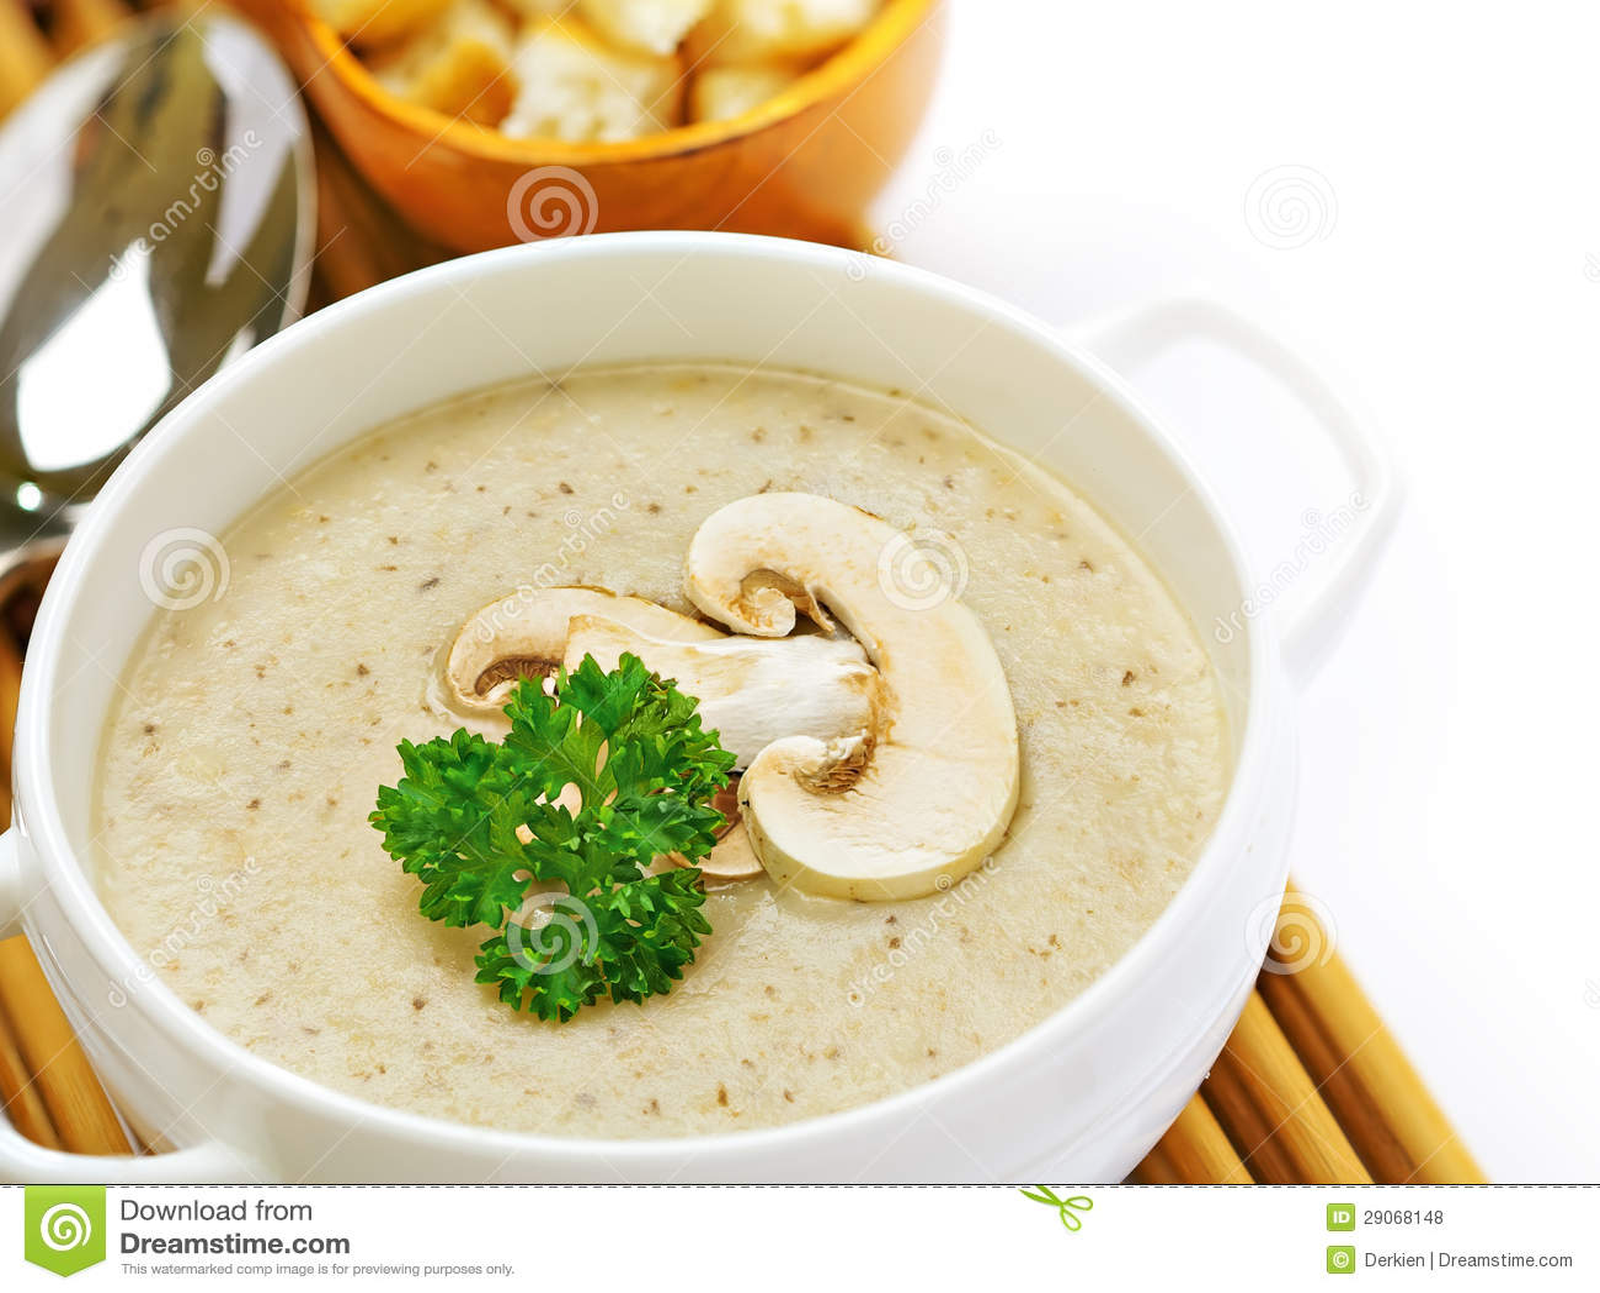 Mushroom Cream Soup Royalty Free Stock Photos - Image: 29068148